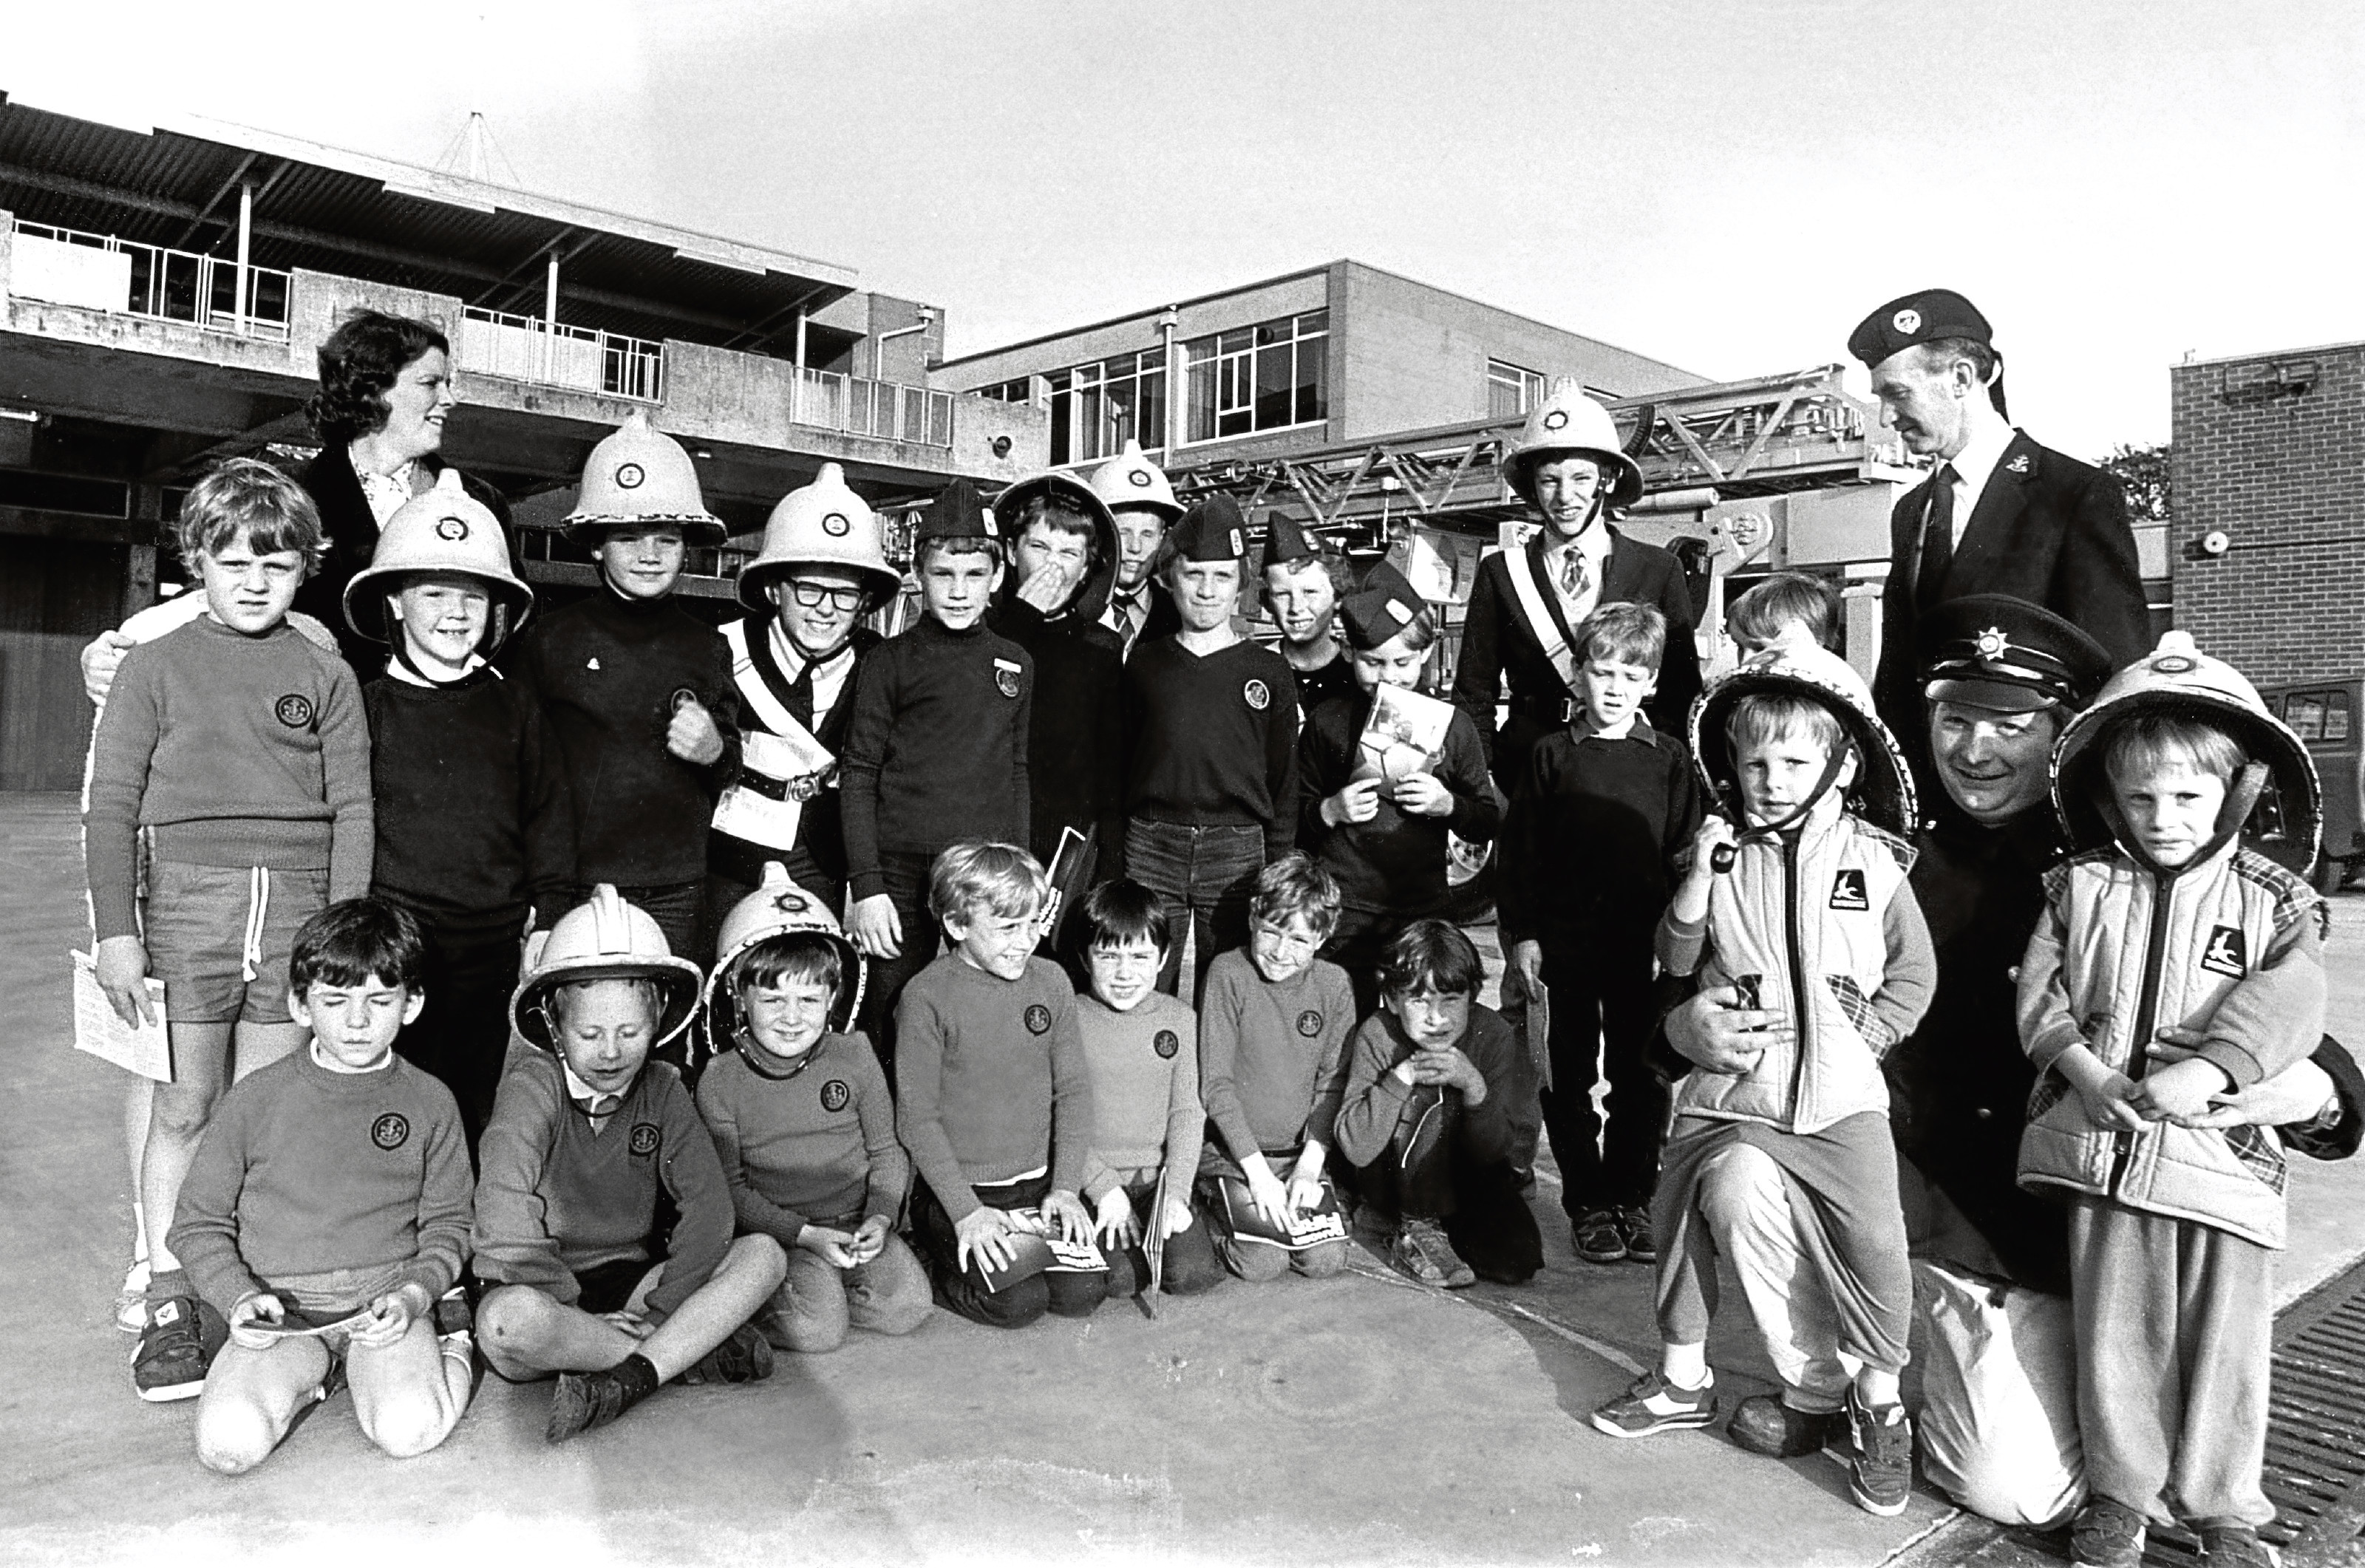 70th Aberdeen Boys' Brigade Company members on a visit to Grampian Fire Brigade HQ.